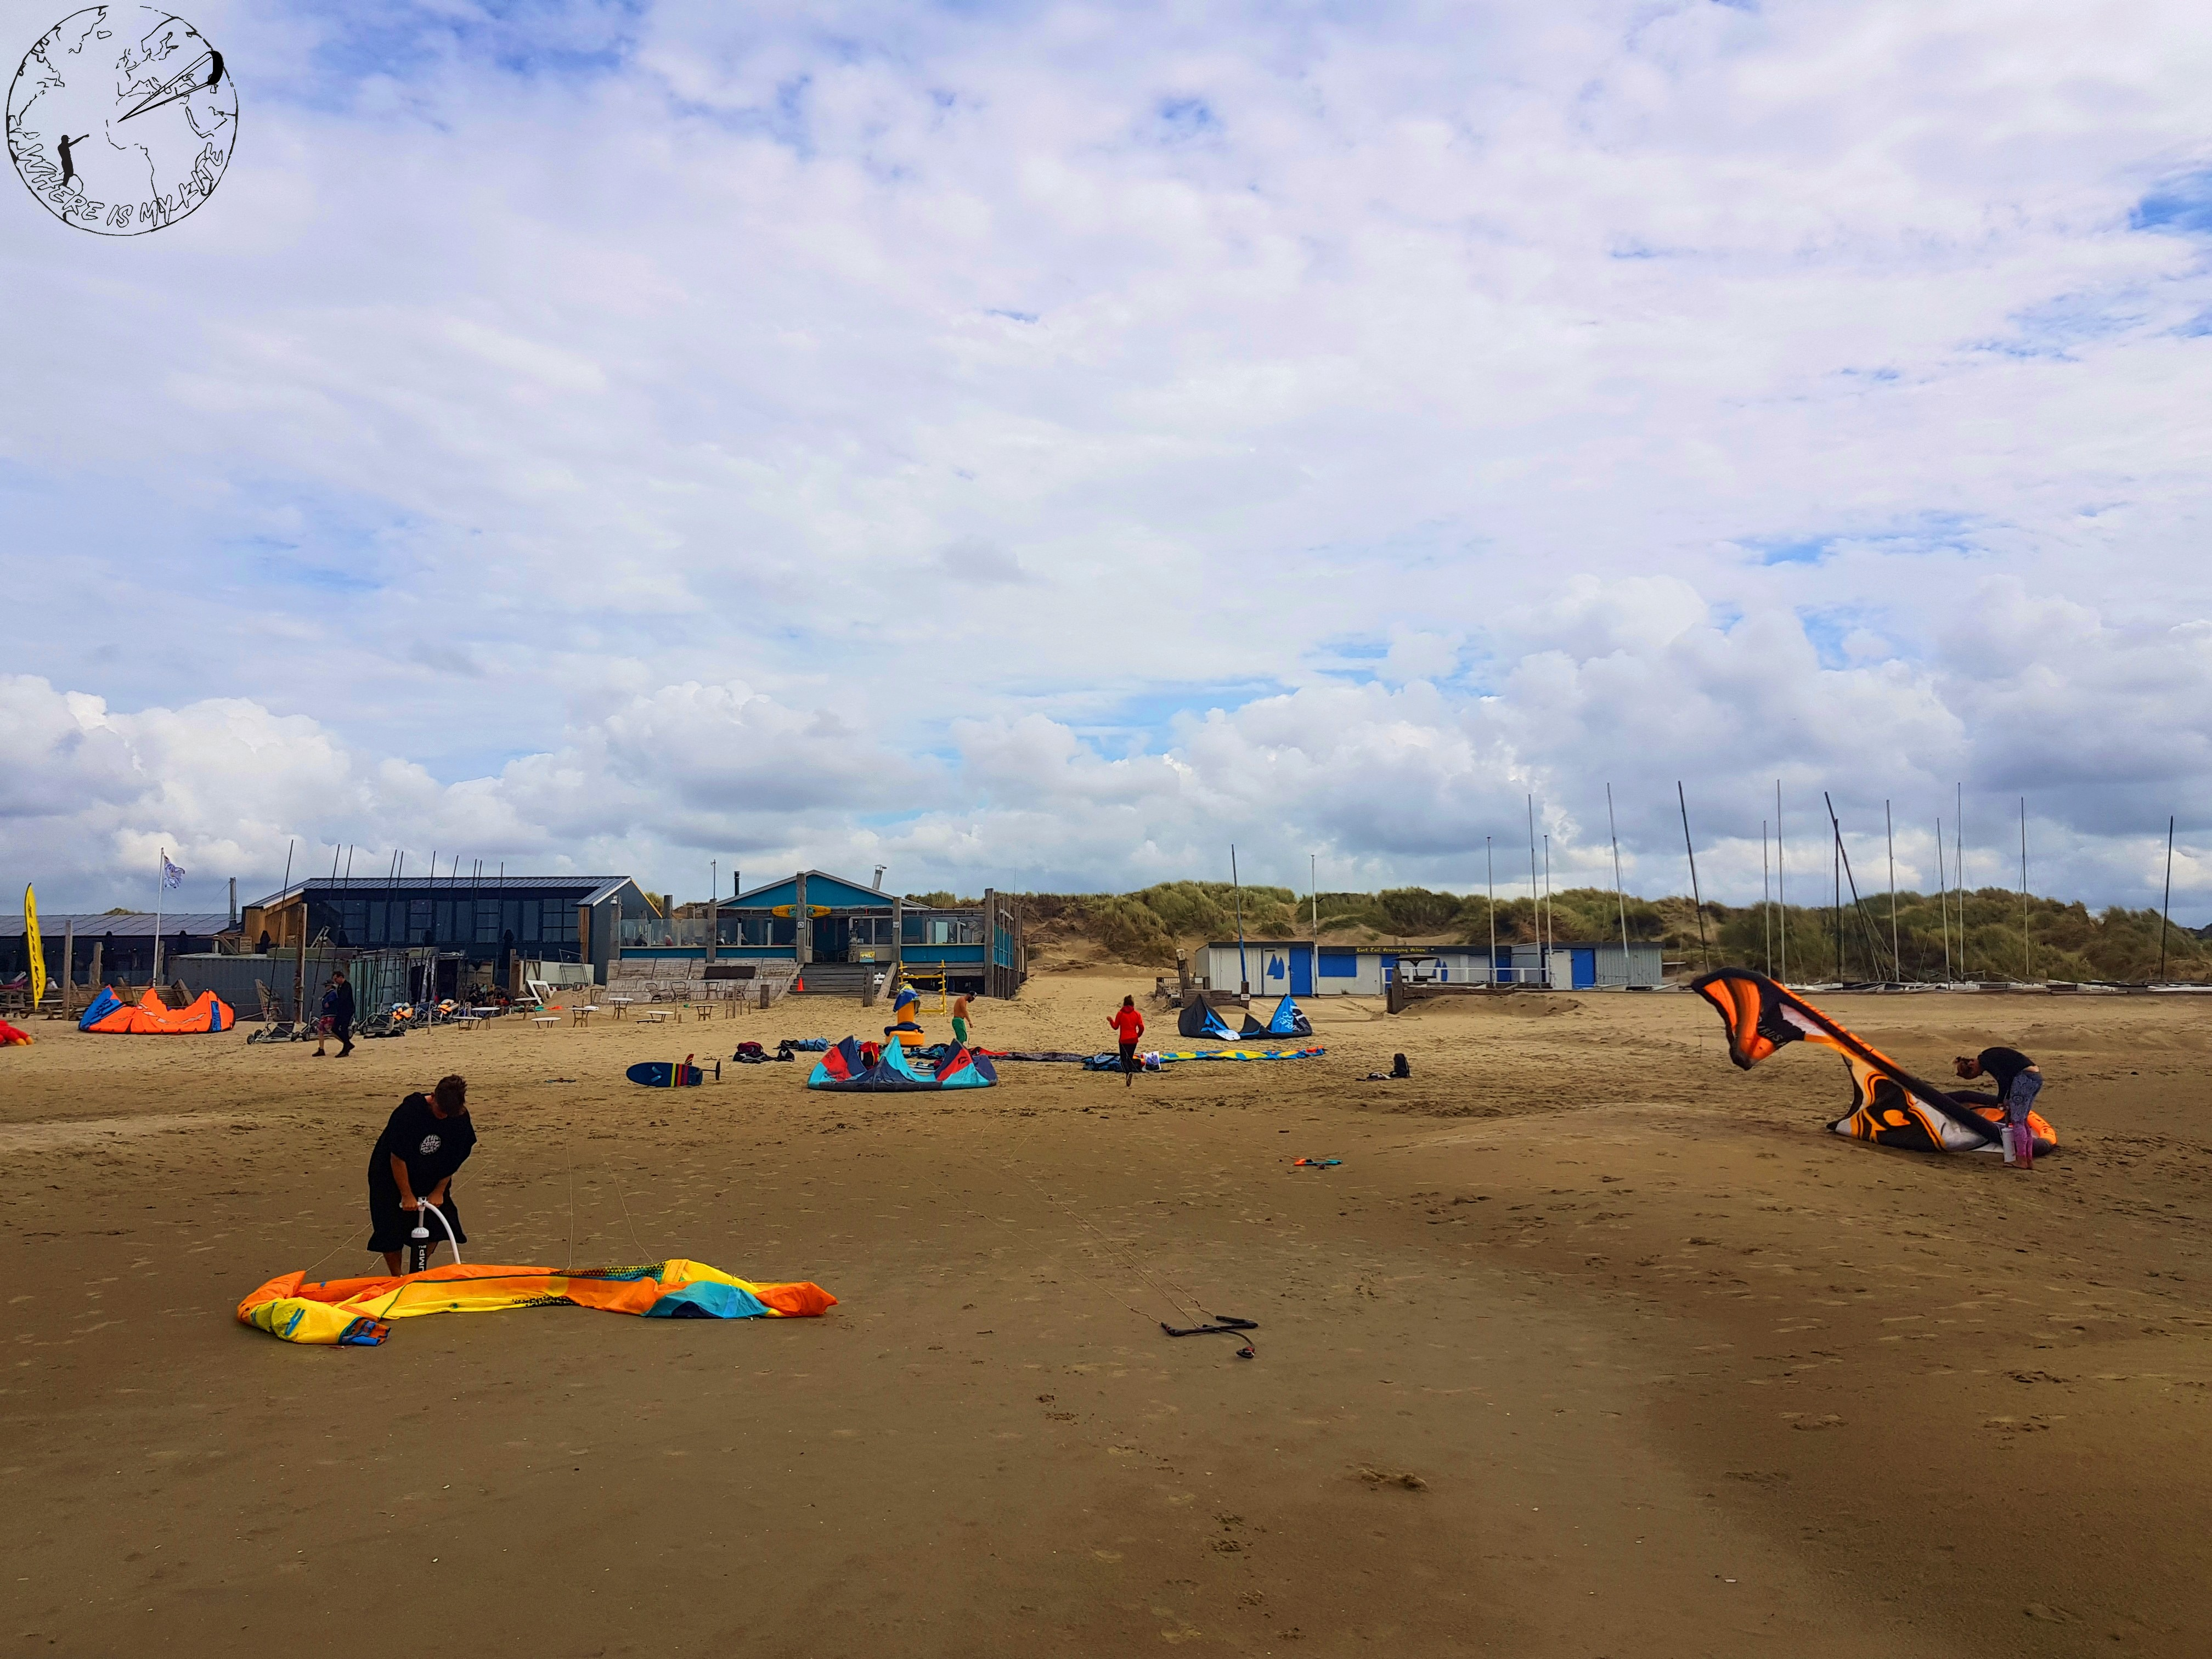 Spot de kitesurf en Hollande, vantrip avec la kite family, zone du restaurant